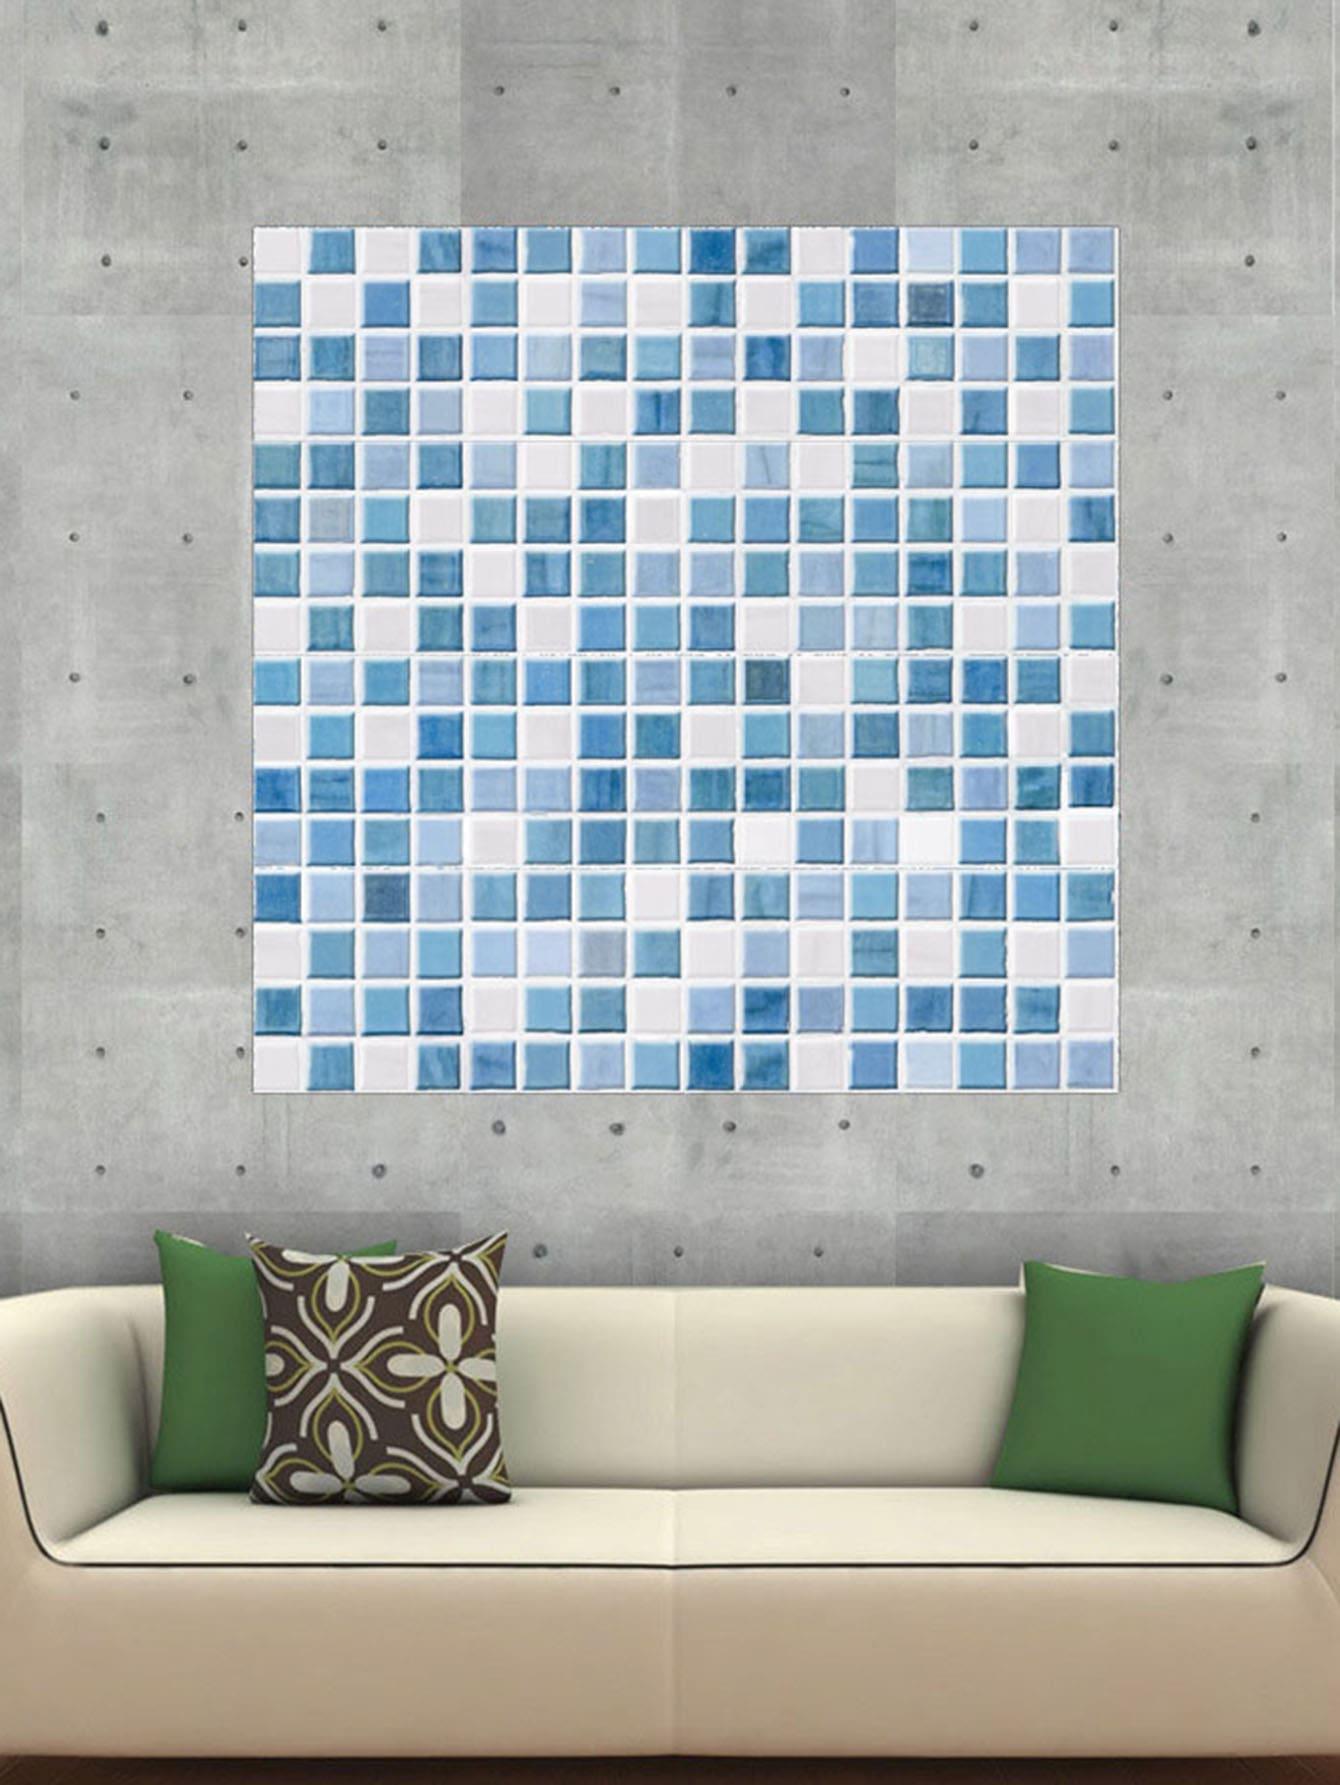 Random Checker Pattern Ceramic Tile Sticker 1pc